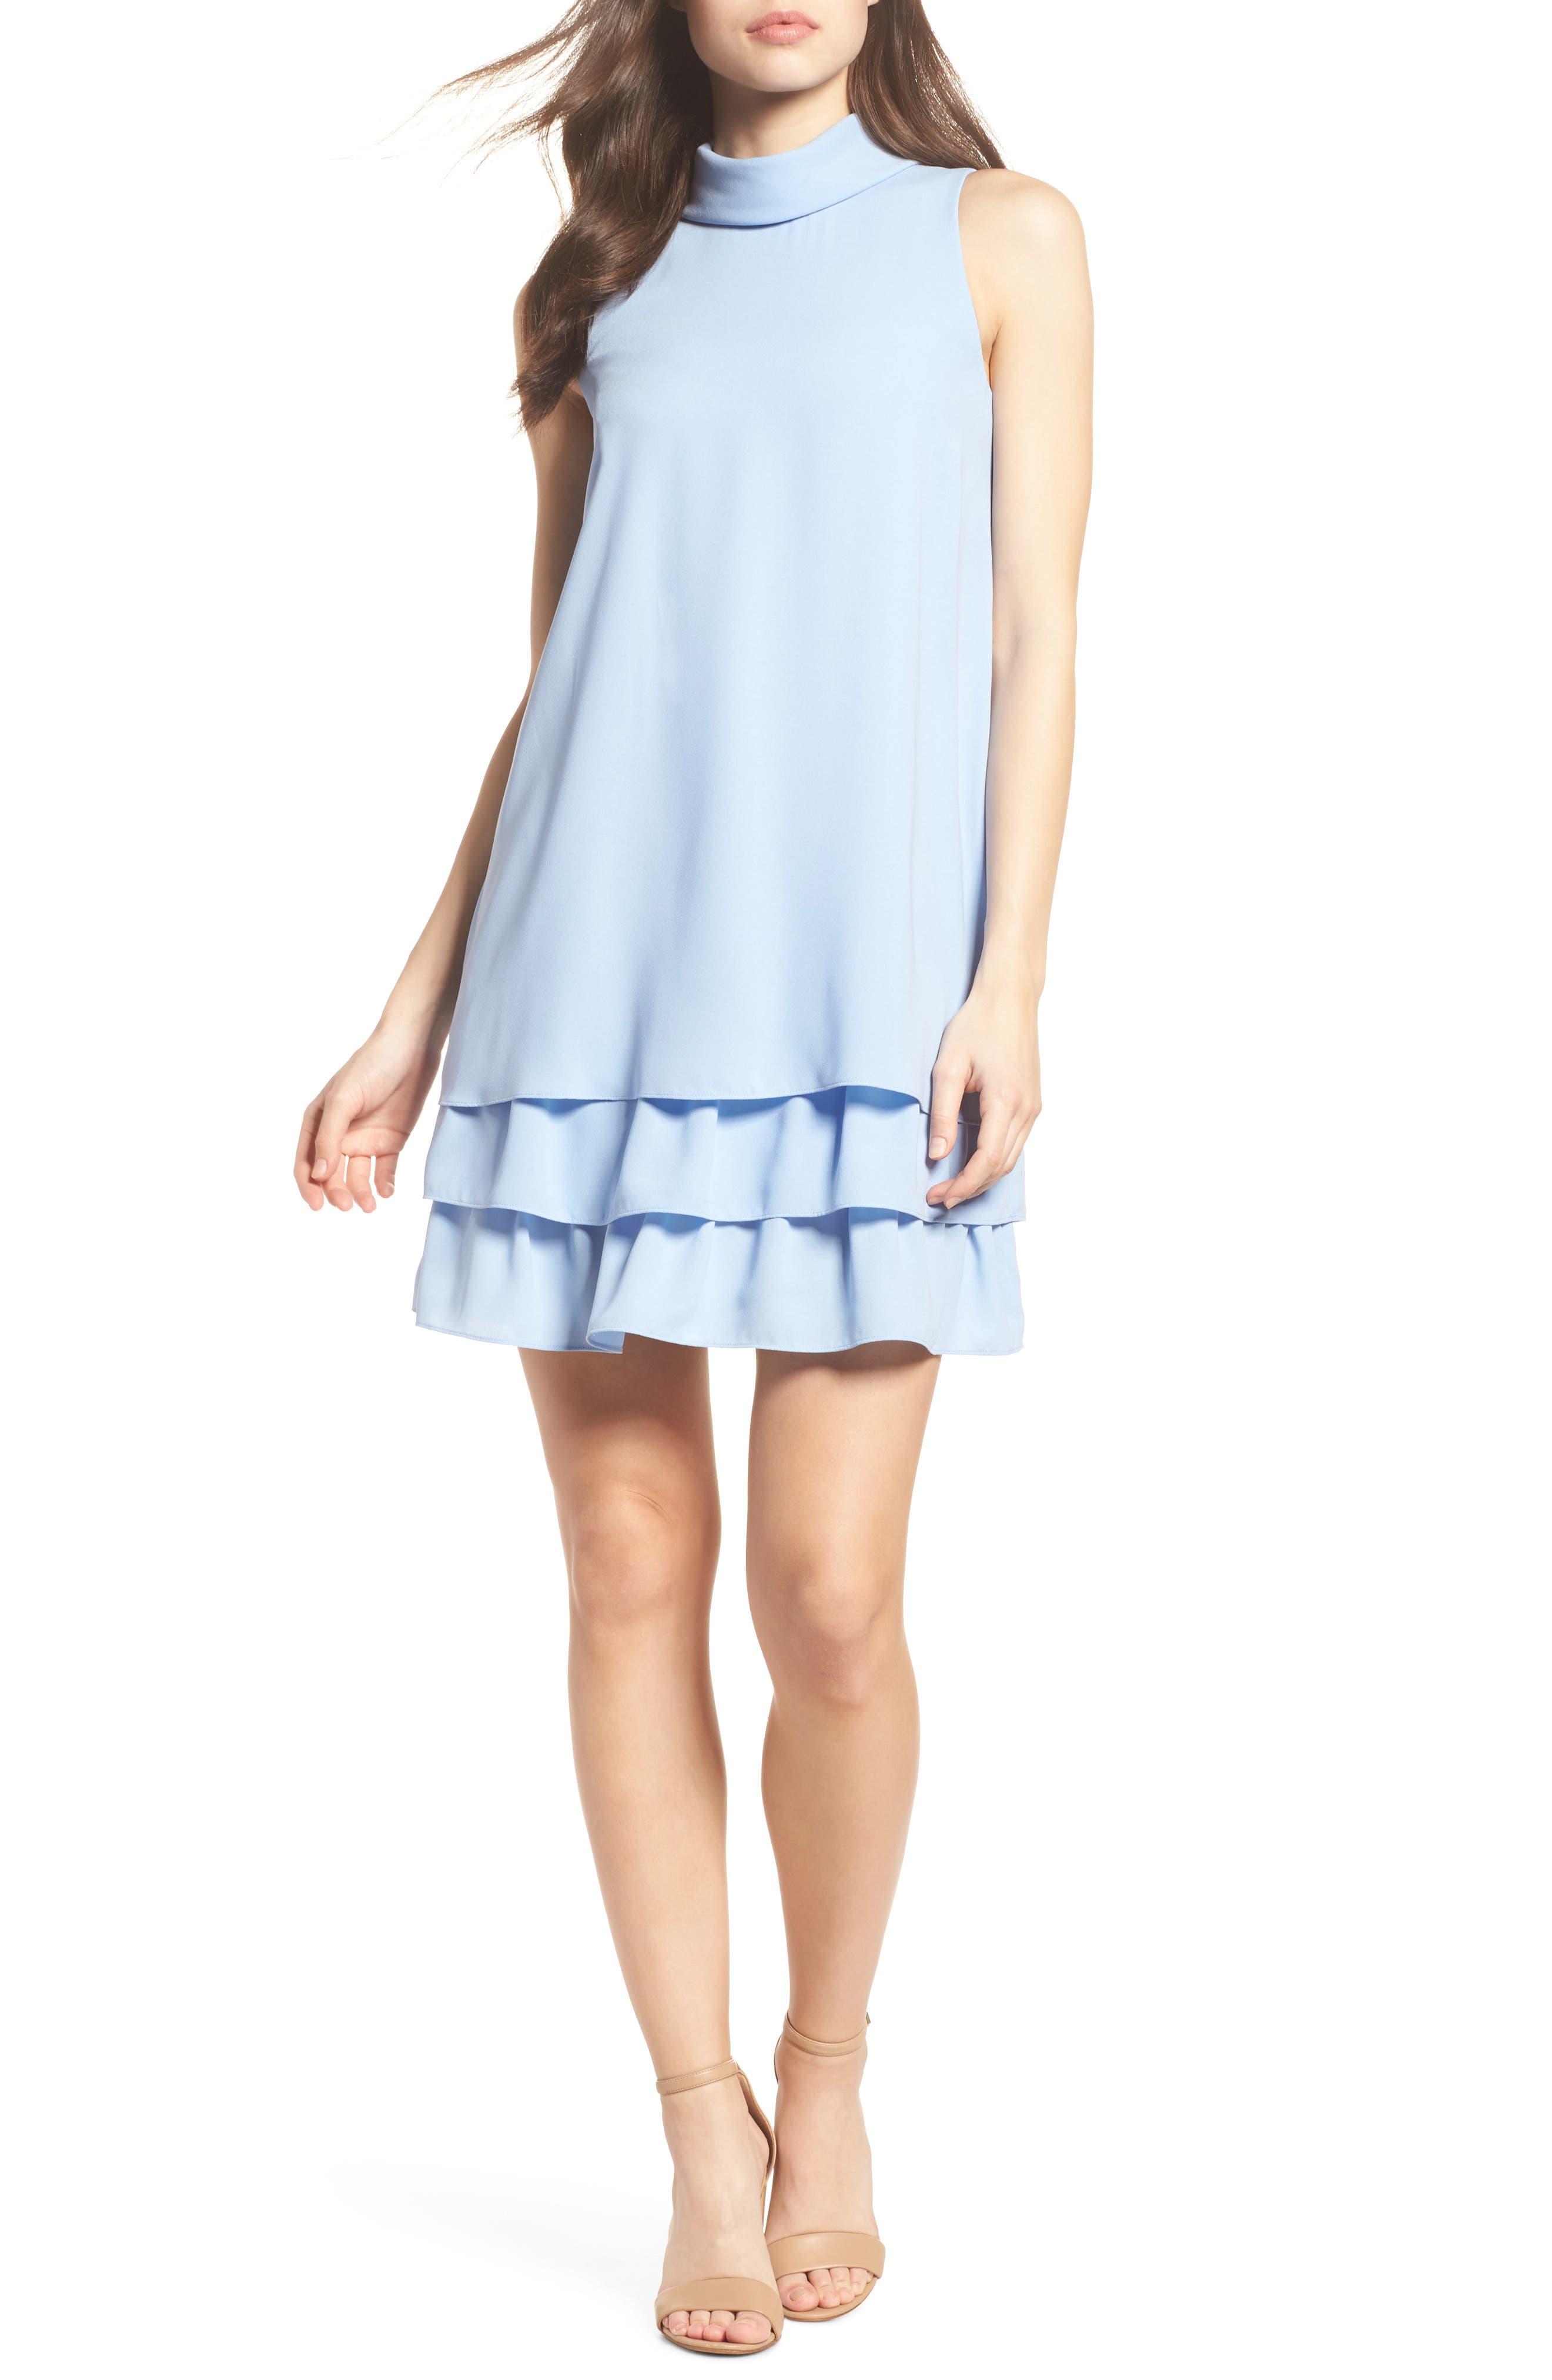 Moss Crepe Roll Neck Ruffle Dress,                             Main thumbnail 1, color,                             Light Blue